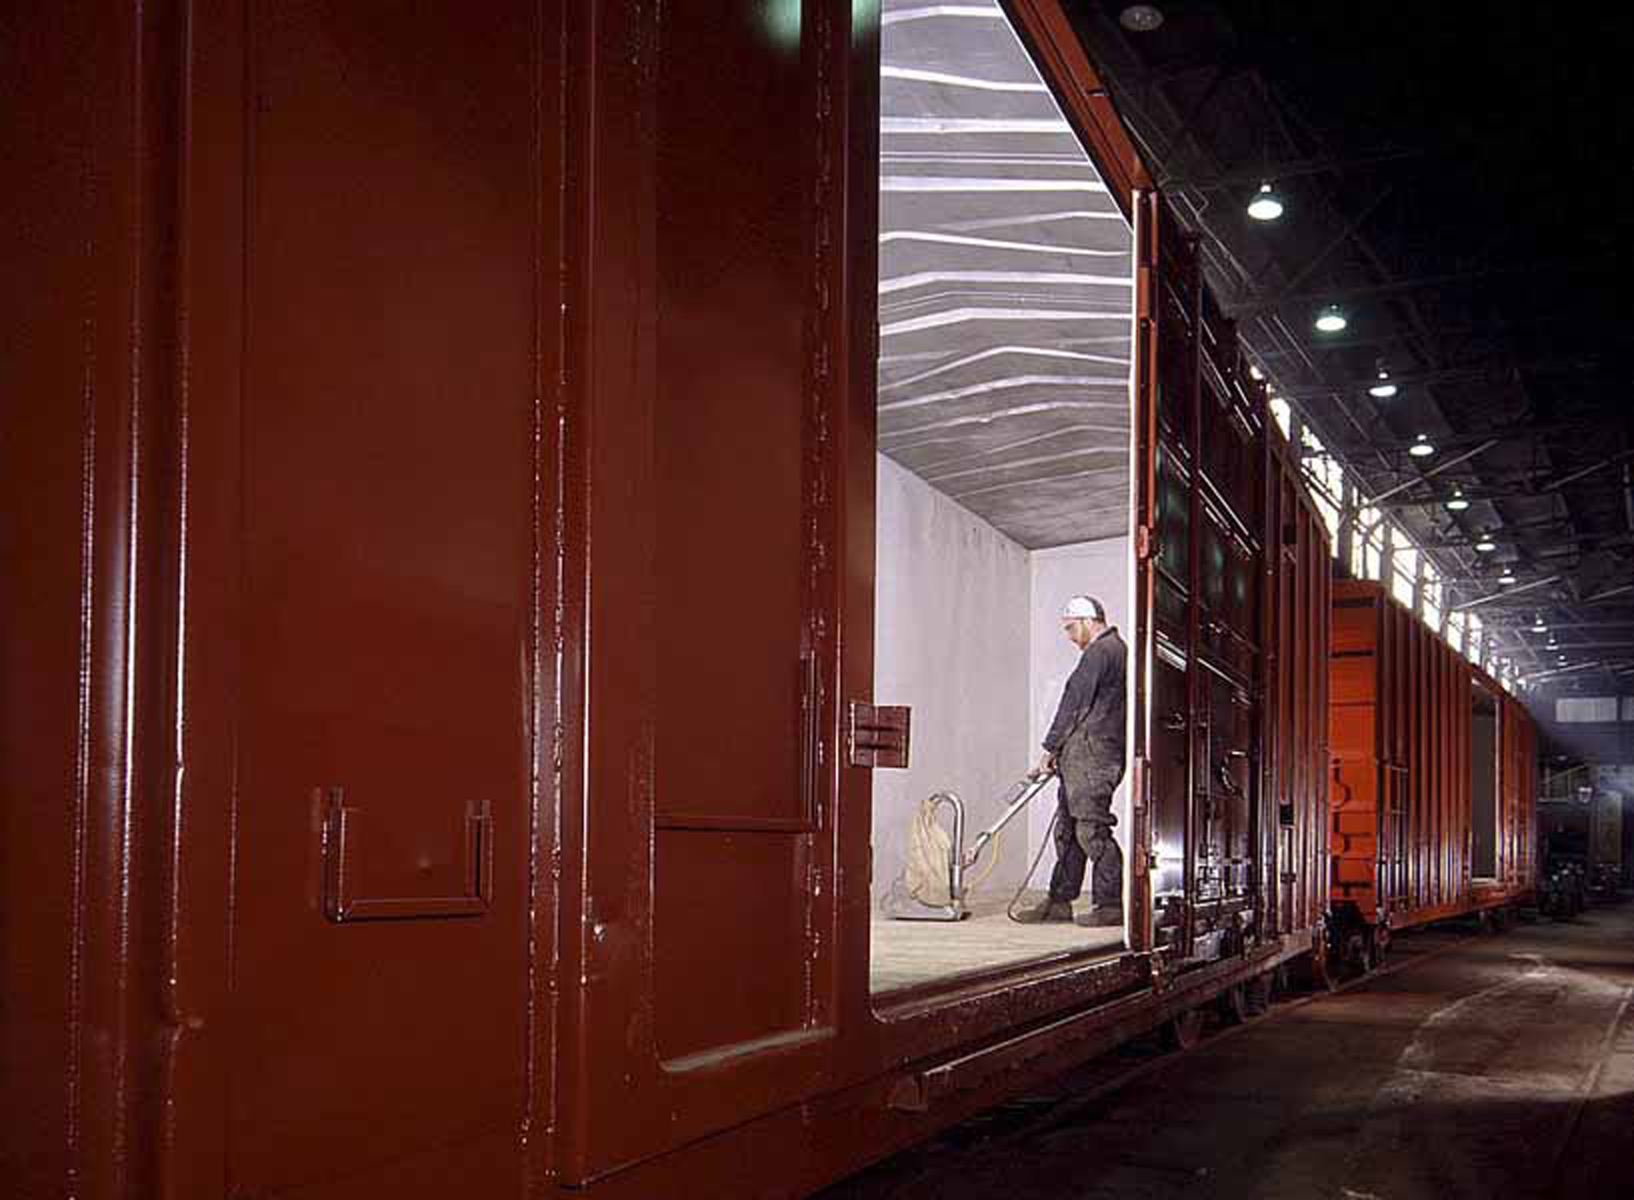 Train Refurbish (commercial Work) by MMPhoto in Regular Member Gallery